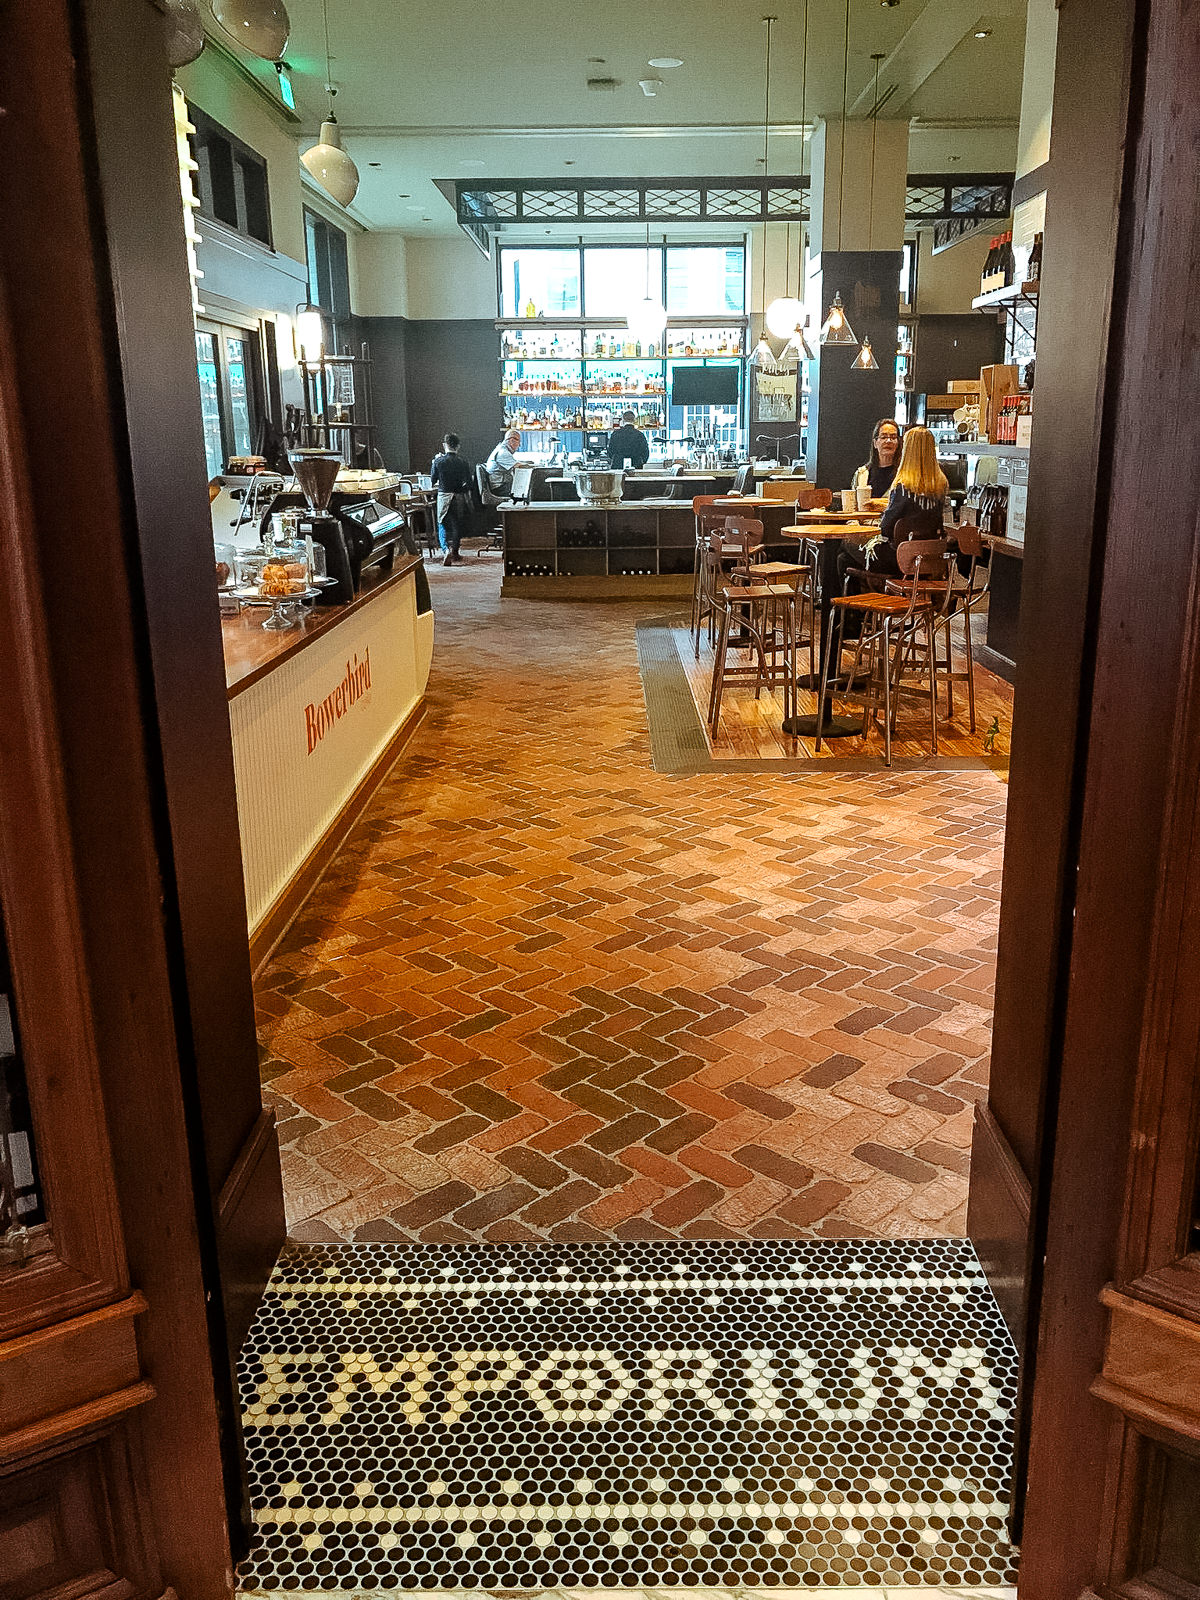 perry-lane-hotel-emporium-breakfast-savannah-georgia